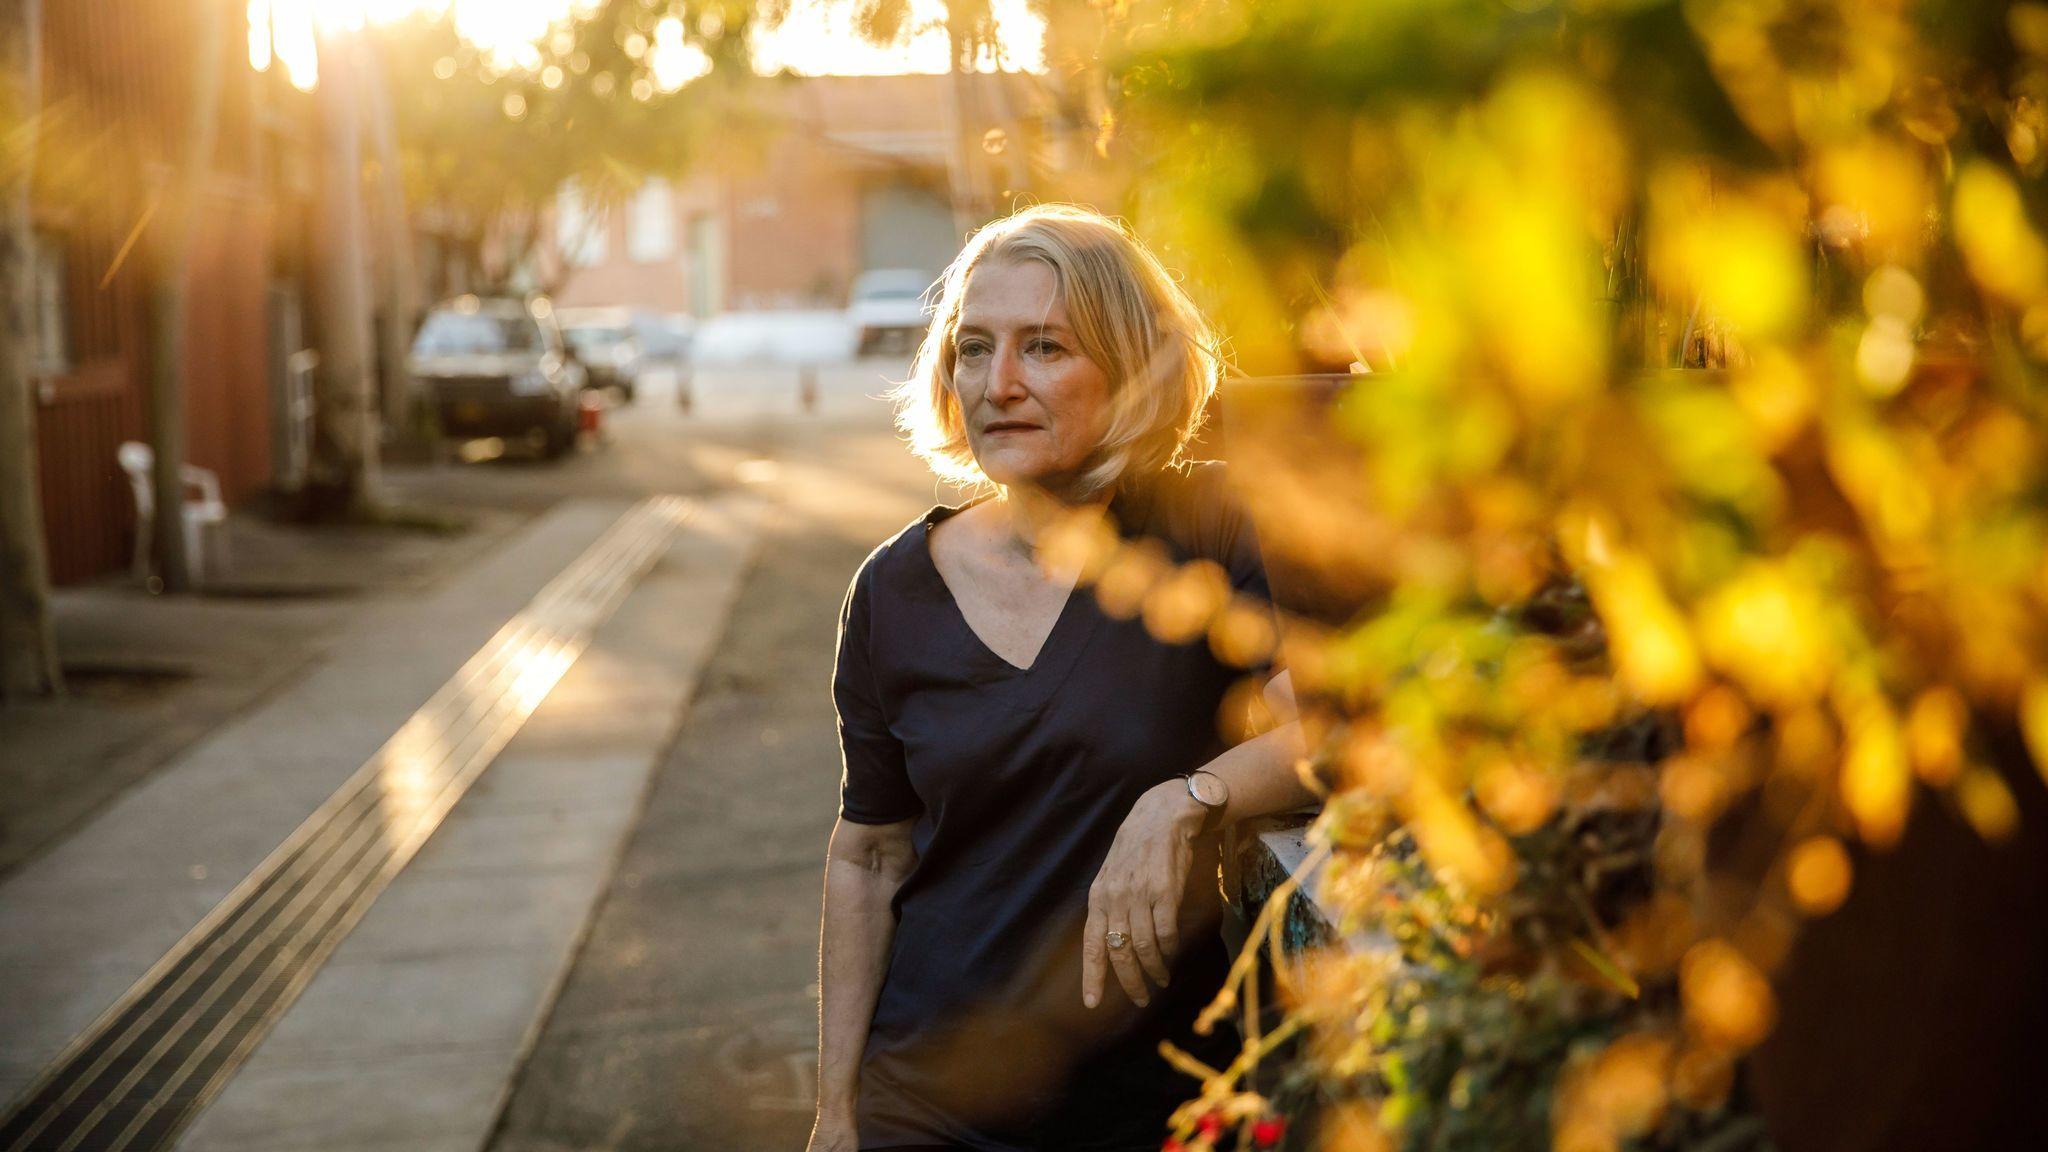 Artist Sylvia Tidwell outside of Los Angeles' Santa Fe Art Colony, where she is head of the tenants association.